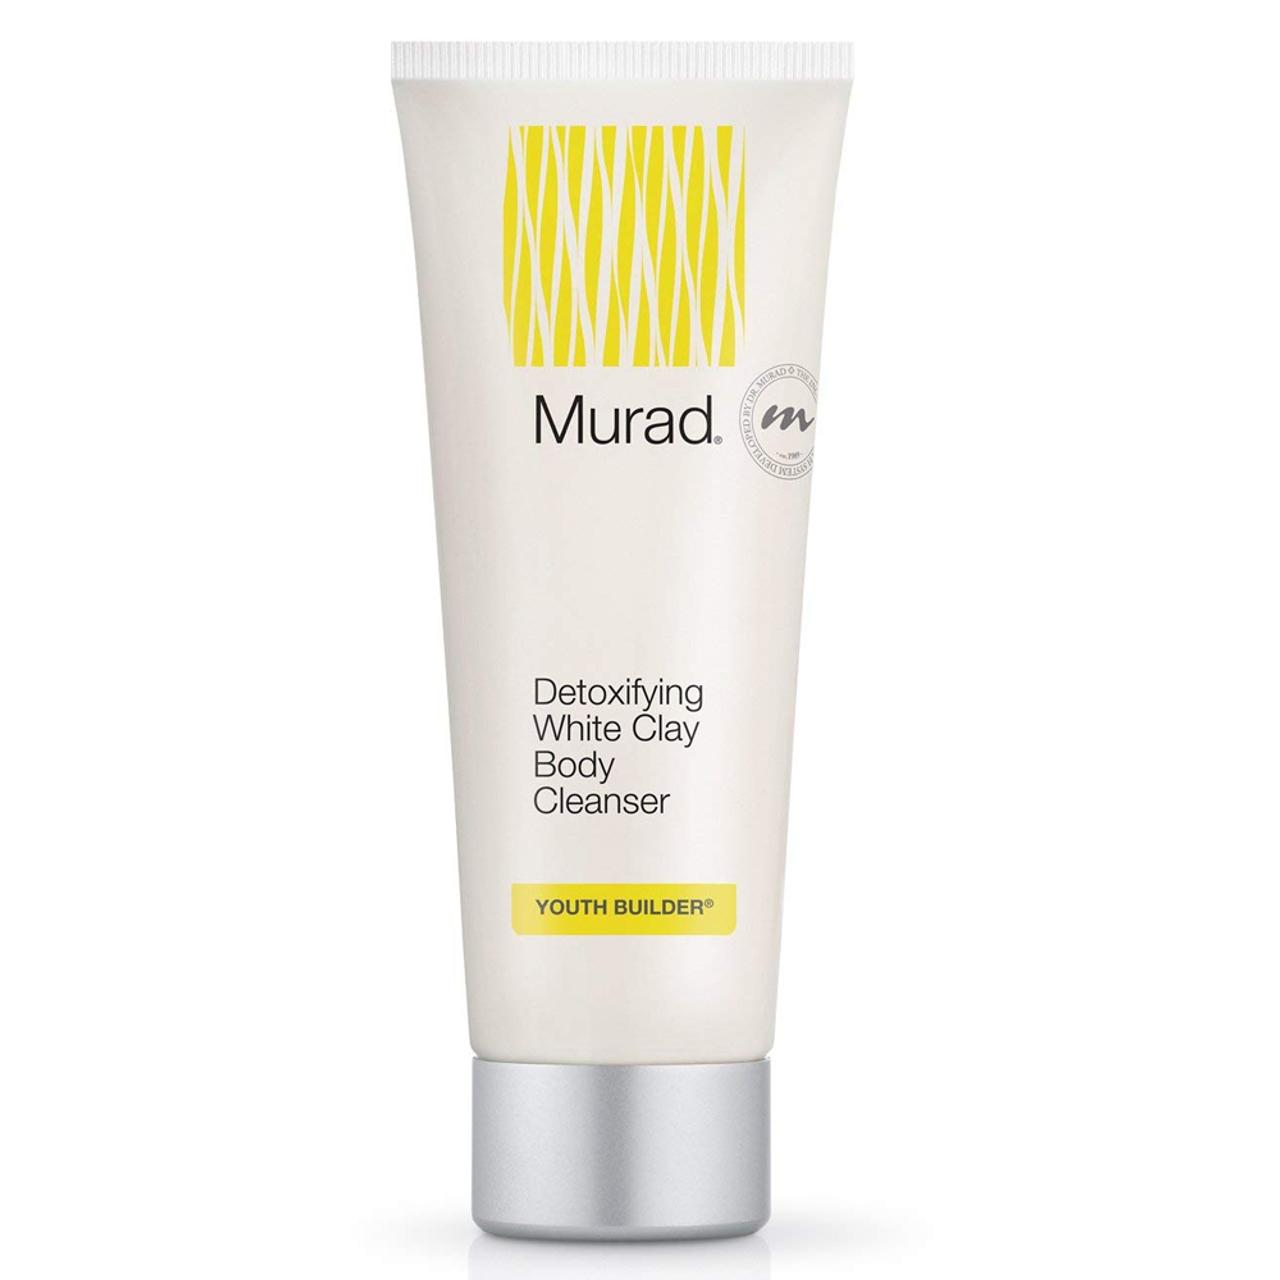 Murad Detoxifying White Clay Body Cleanser 6.75oz